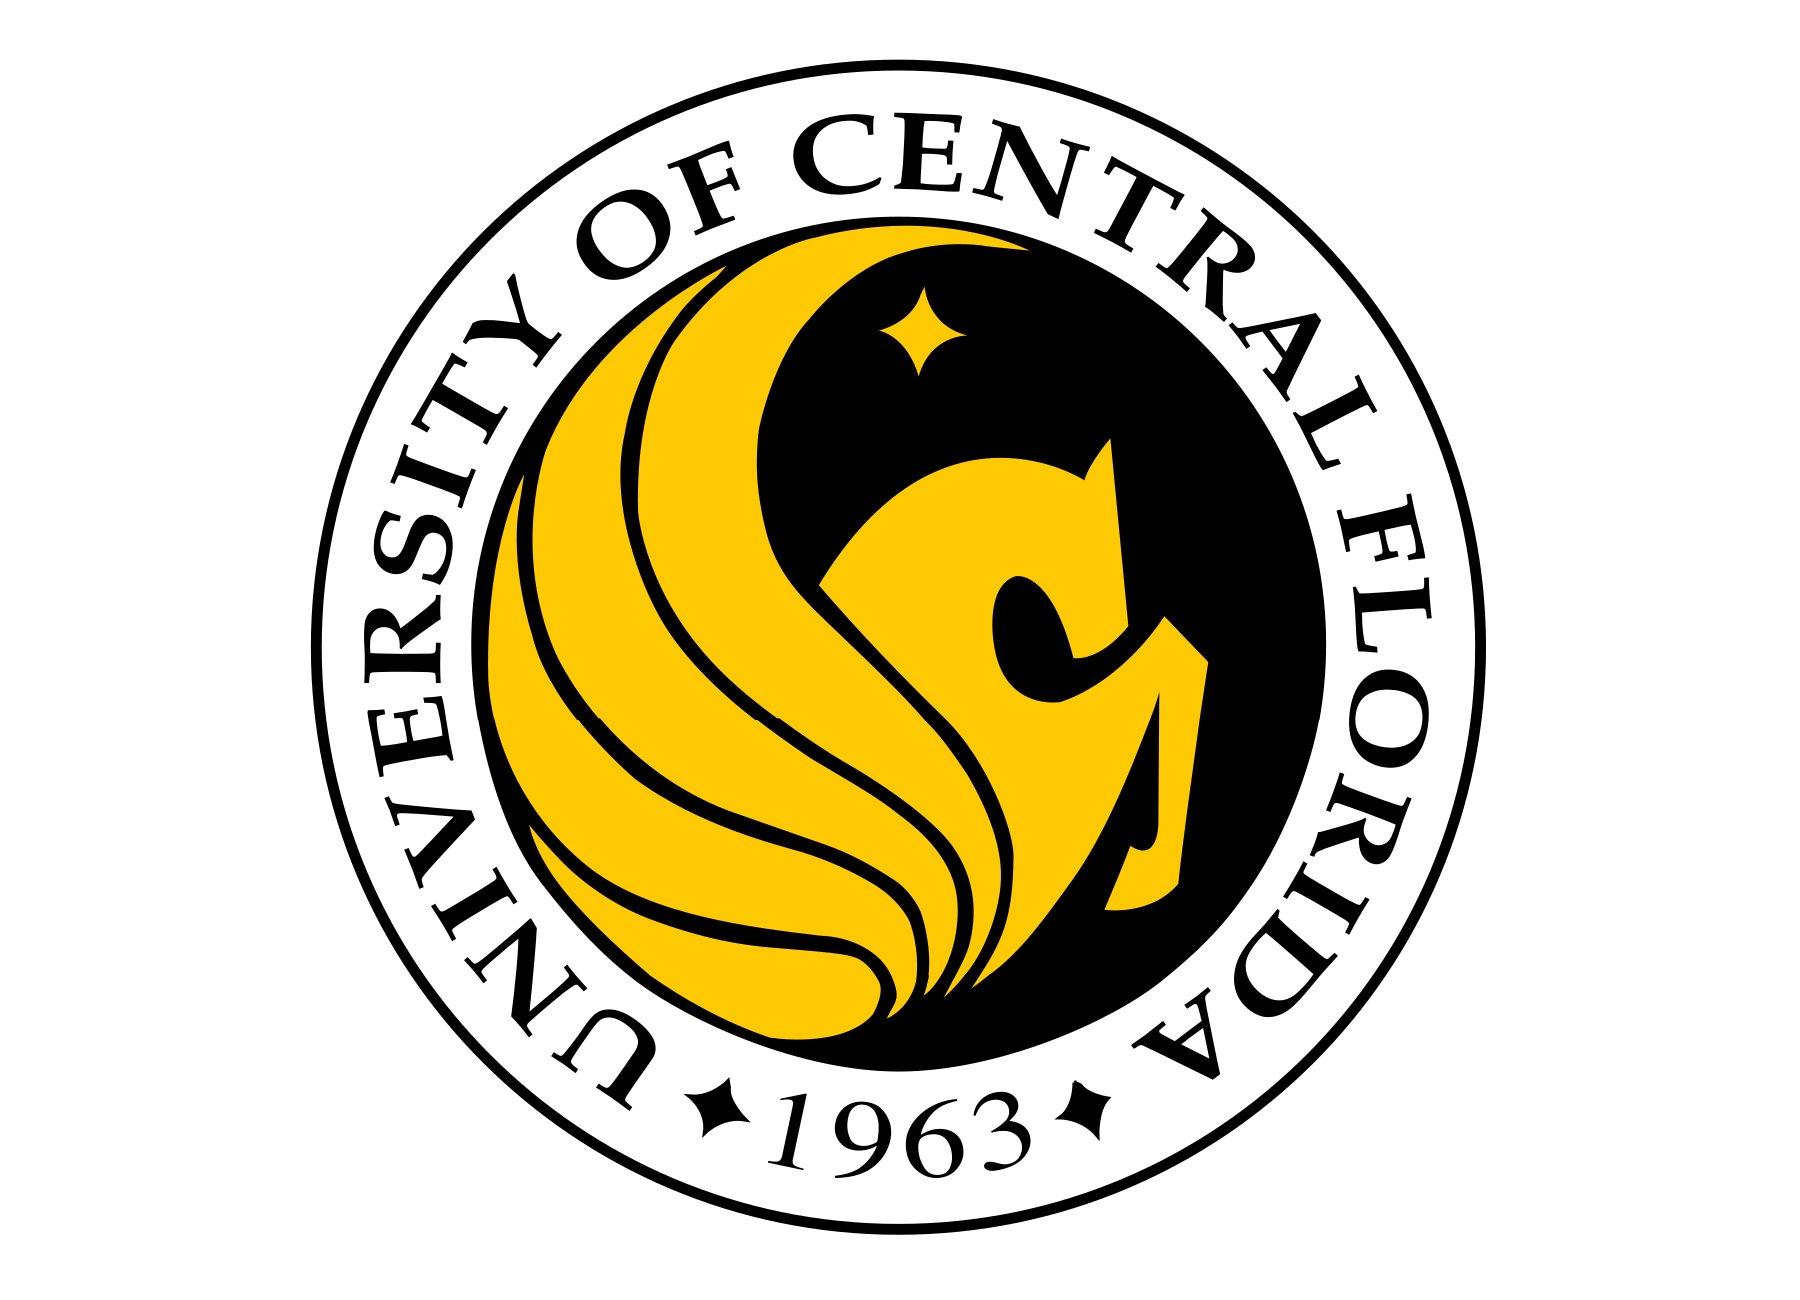 University of central florida logo university of central florida athletic symbols university of central florida buycottarizona Gallery